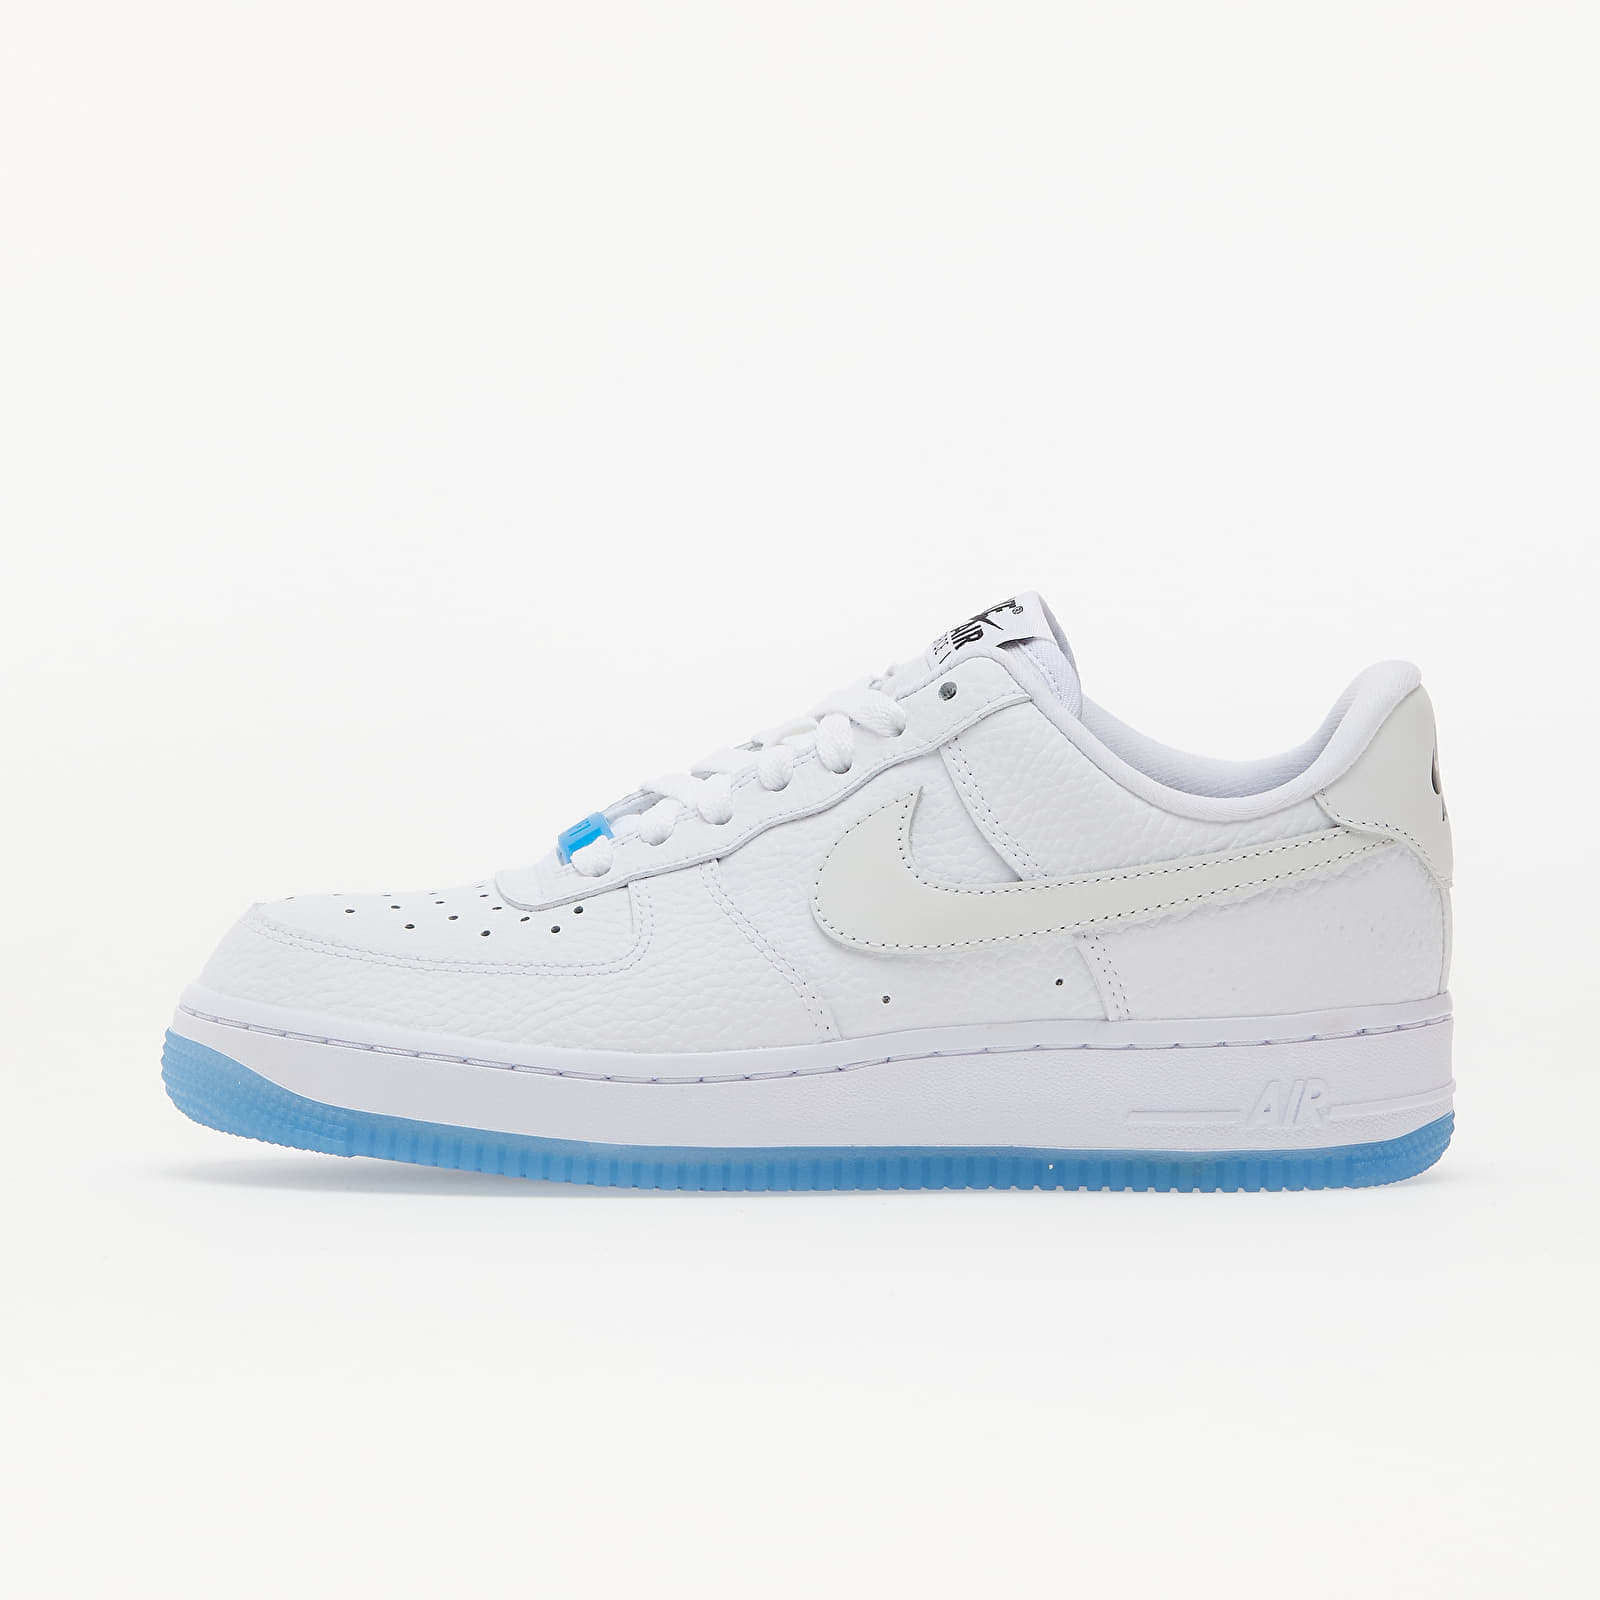 Nike W Air Force 1 '07 LX (UV Reactive) White/ White-White-University Blue EUR 37.5